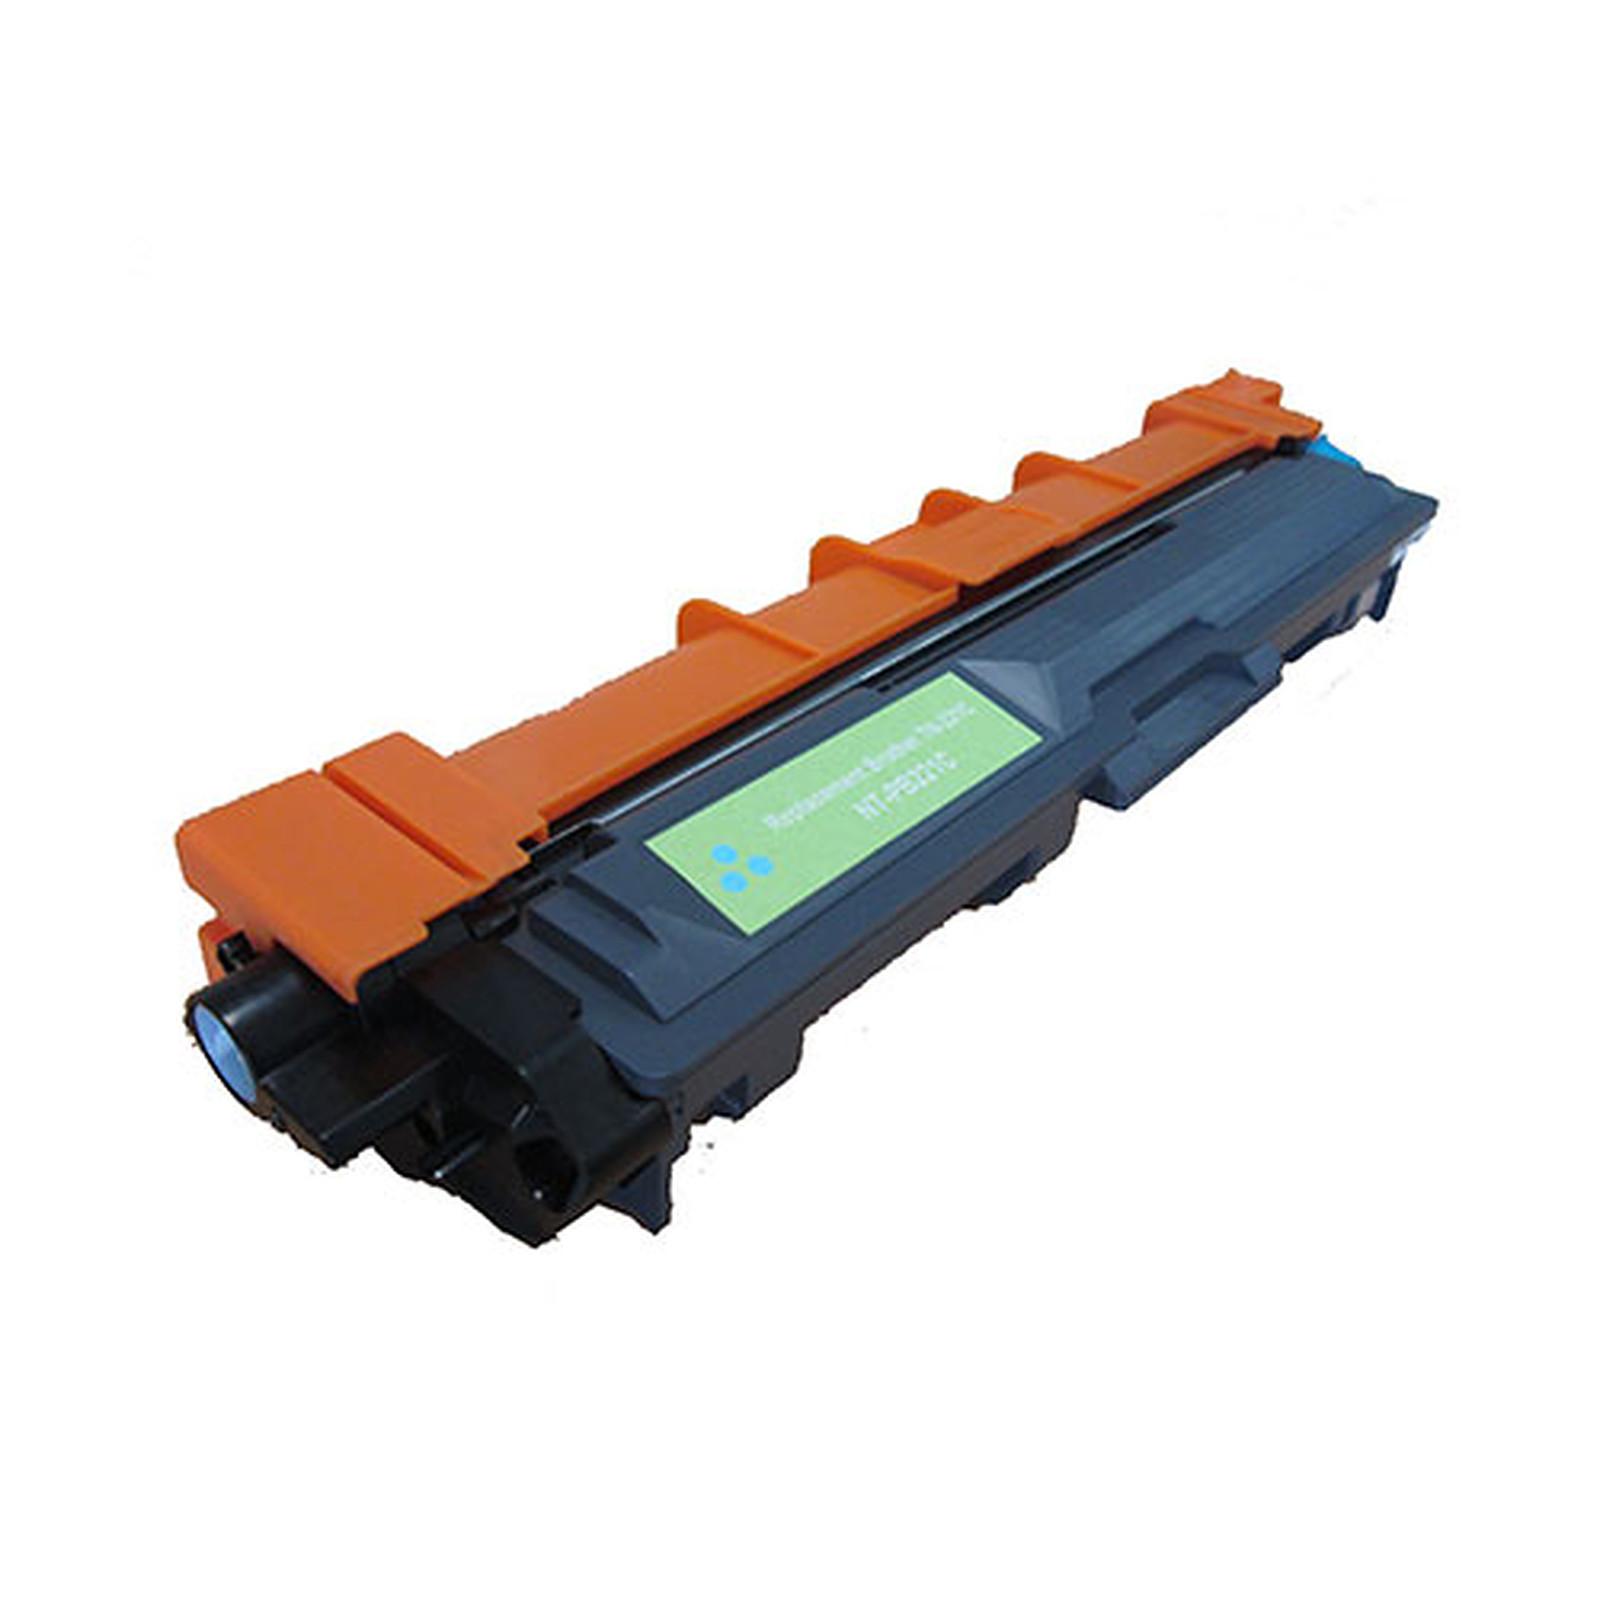 Toner compatible TN-241/245C (Cyan)